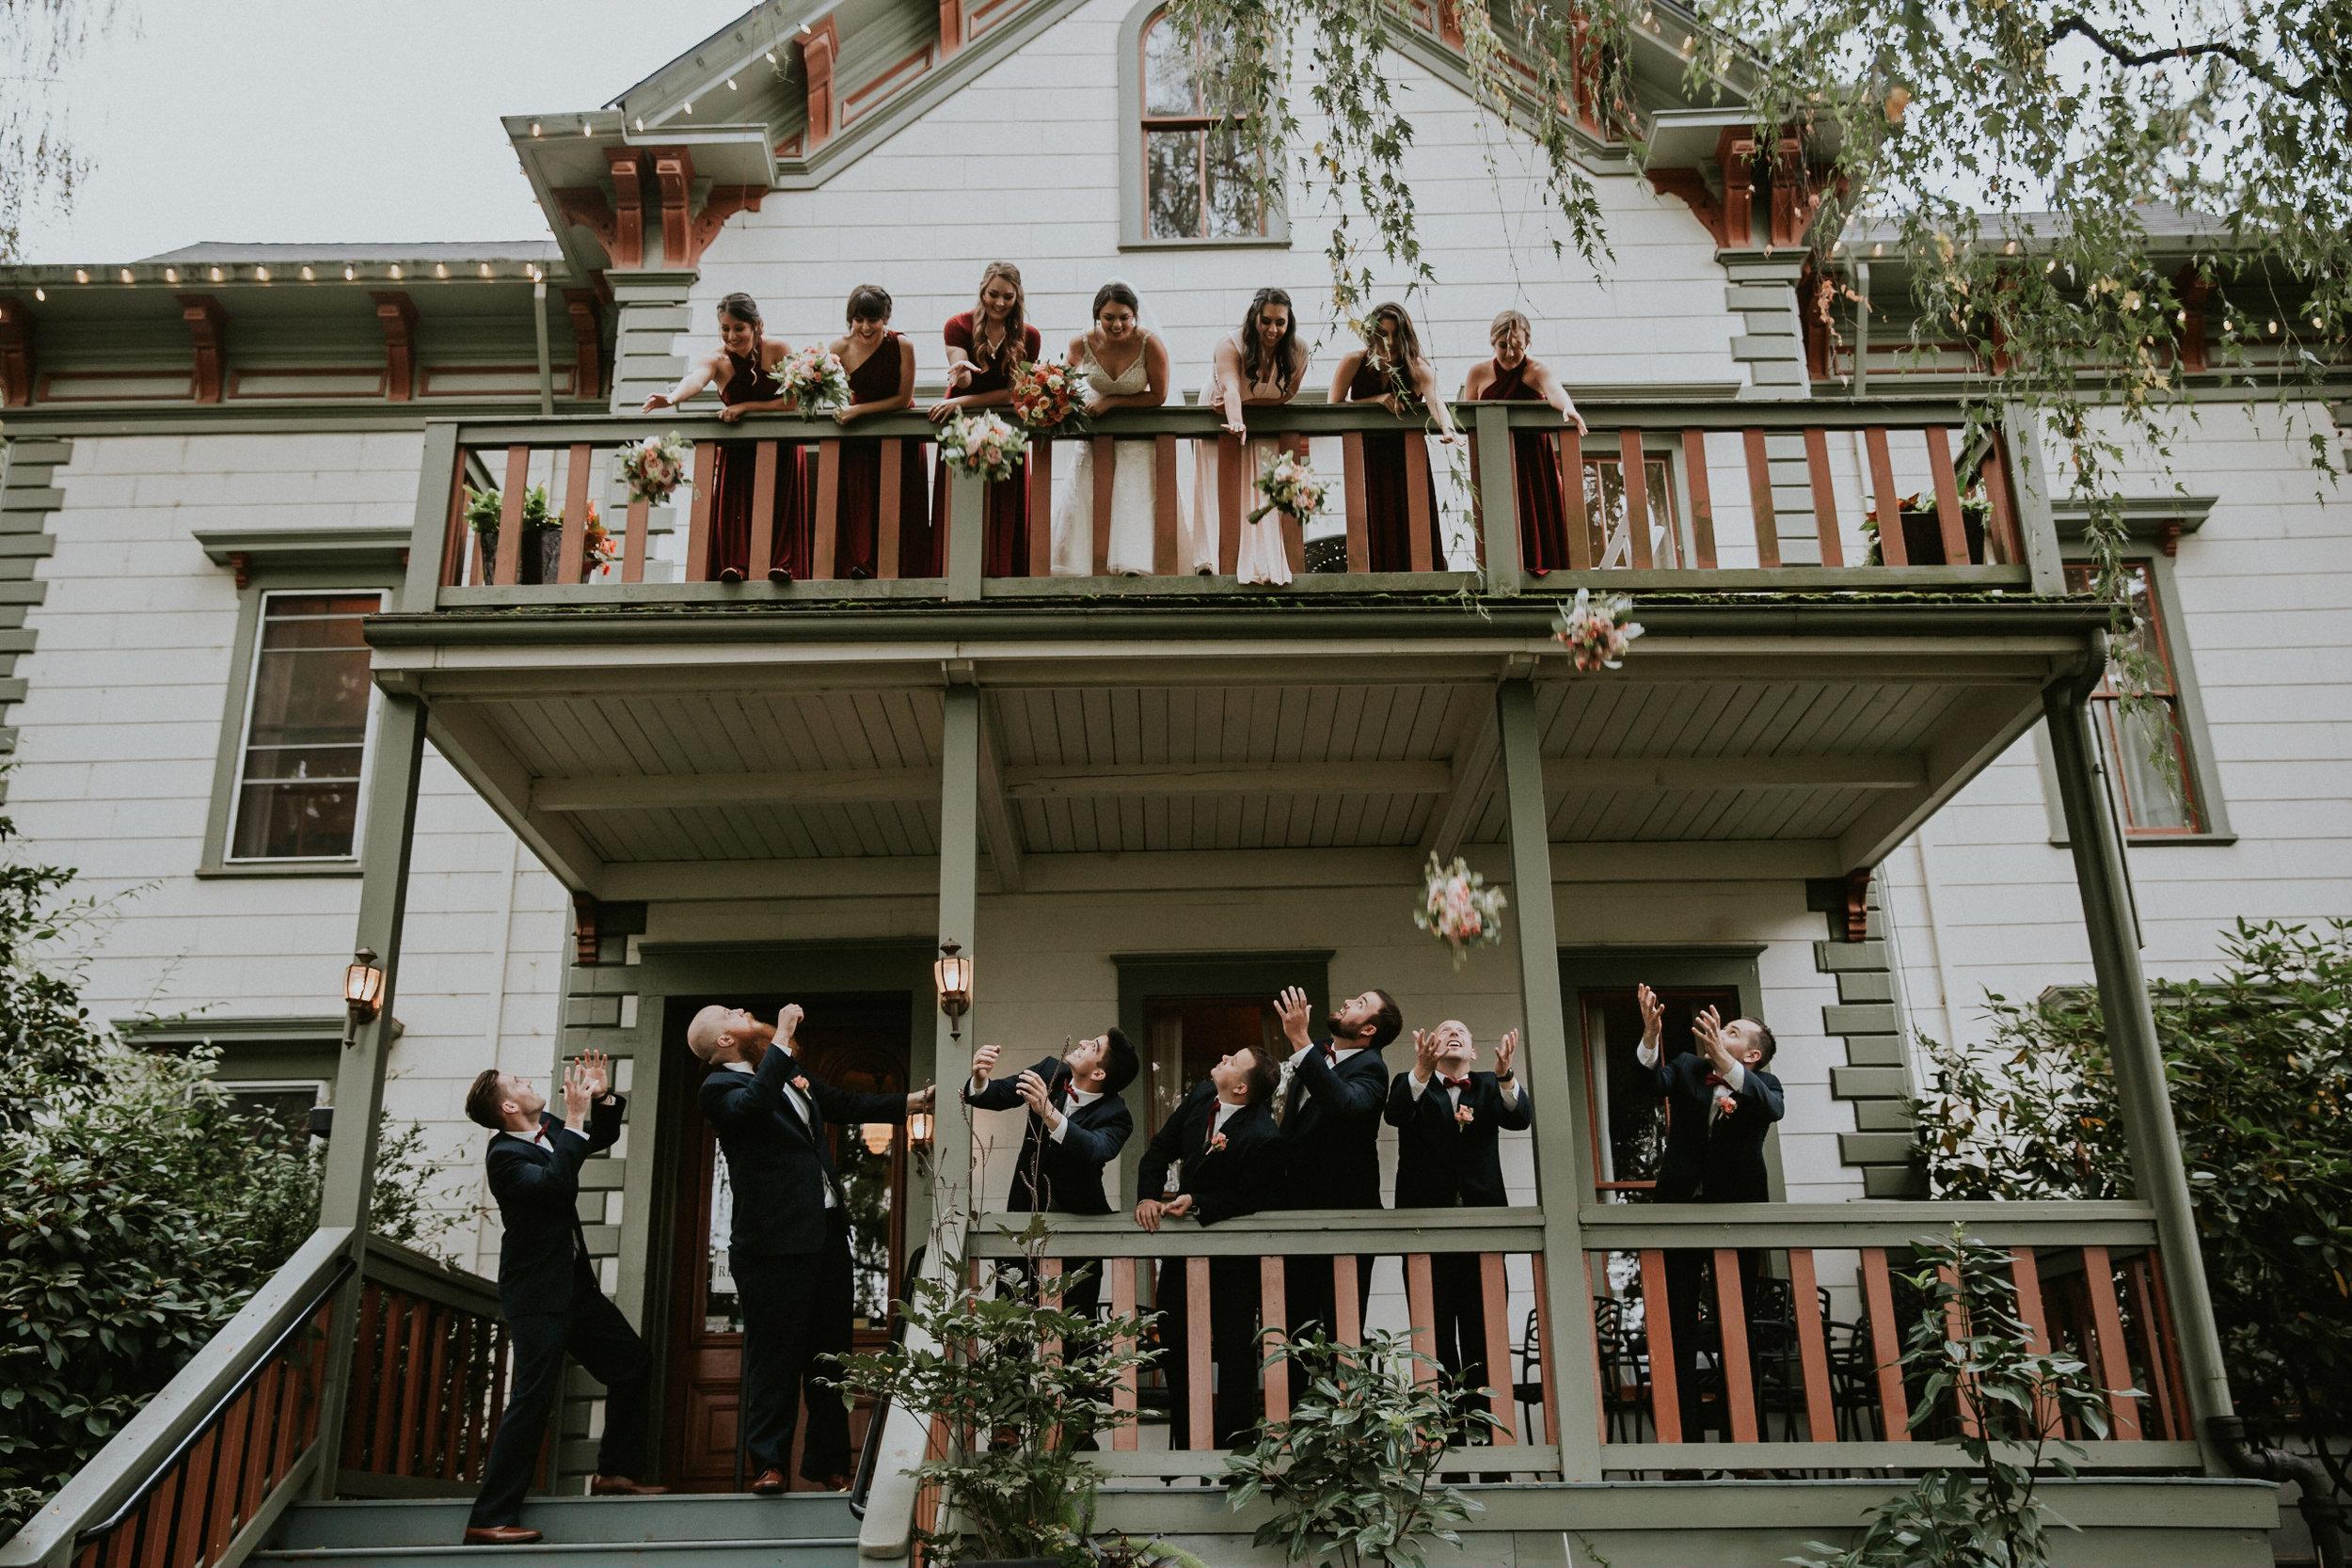 McMenamins_Cornelious_Pass_Roadhouse_wedding_photographer_AlfredTang-5.jpg